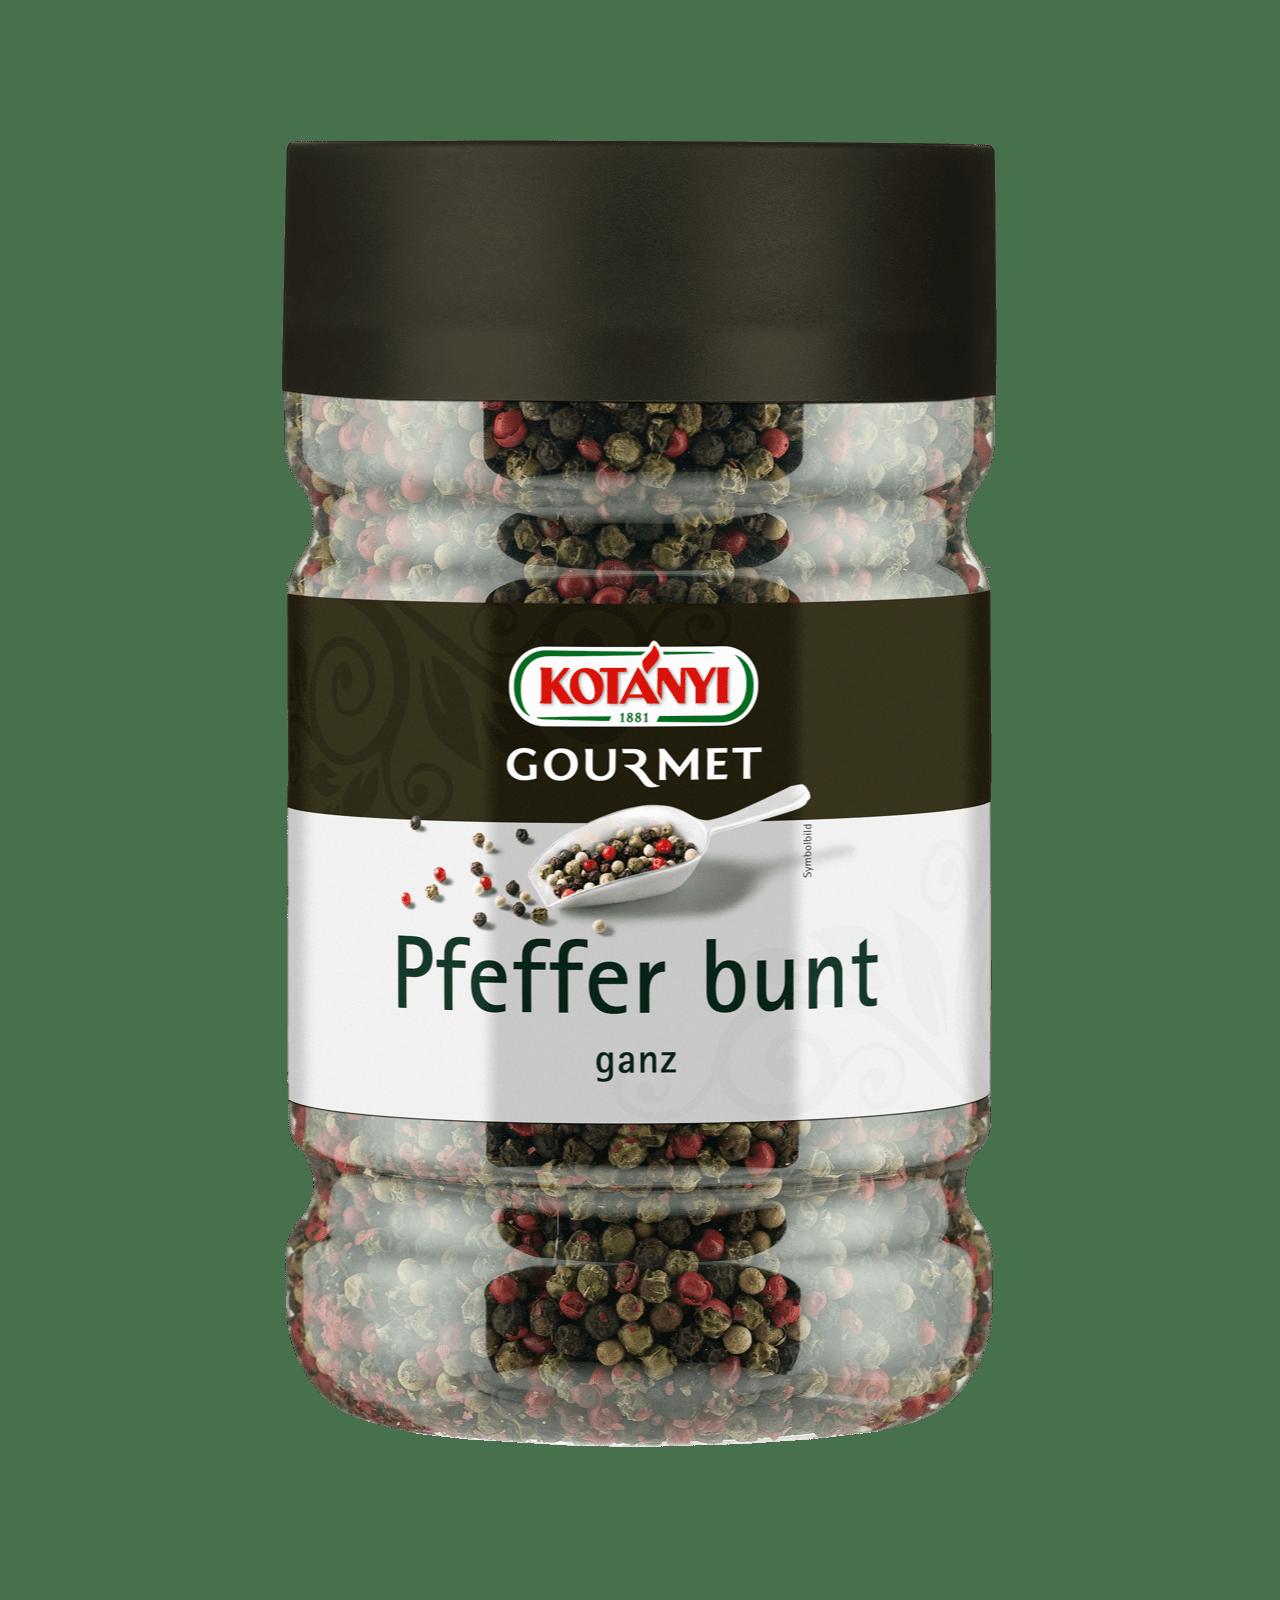 Kotányi Gourmet Pfeffer bunt ganz in der 1200ccm Dose